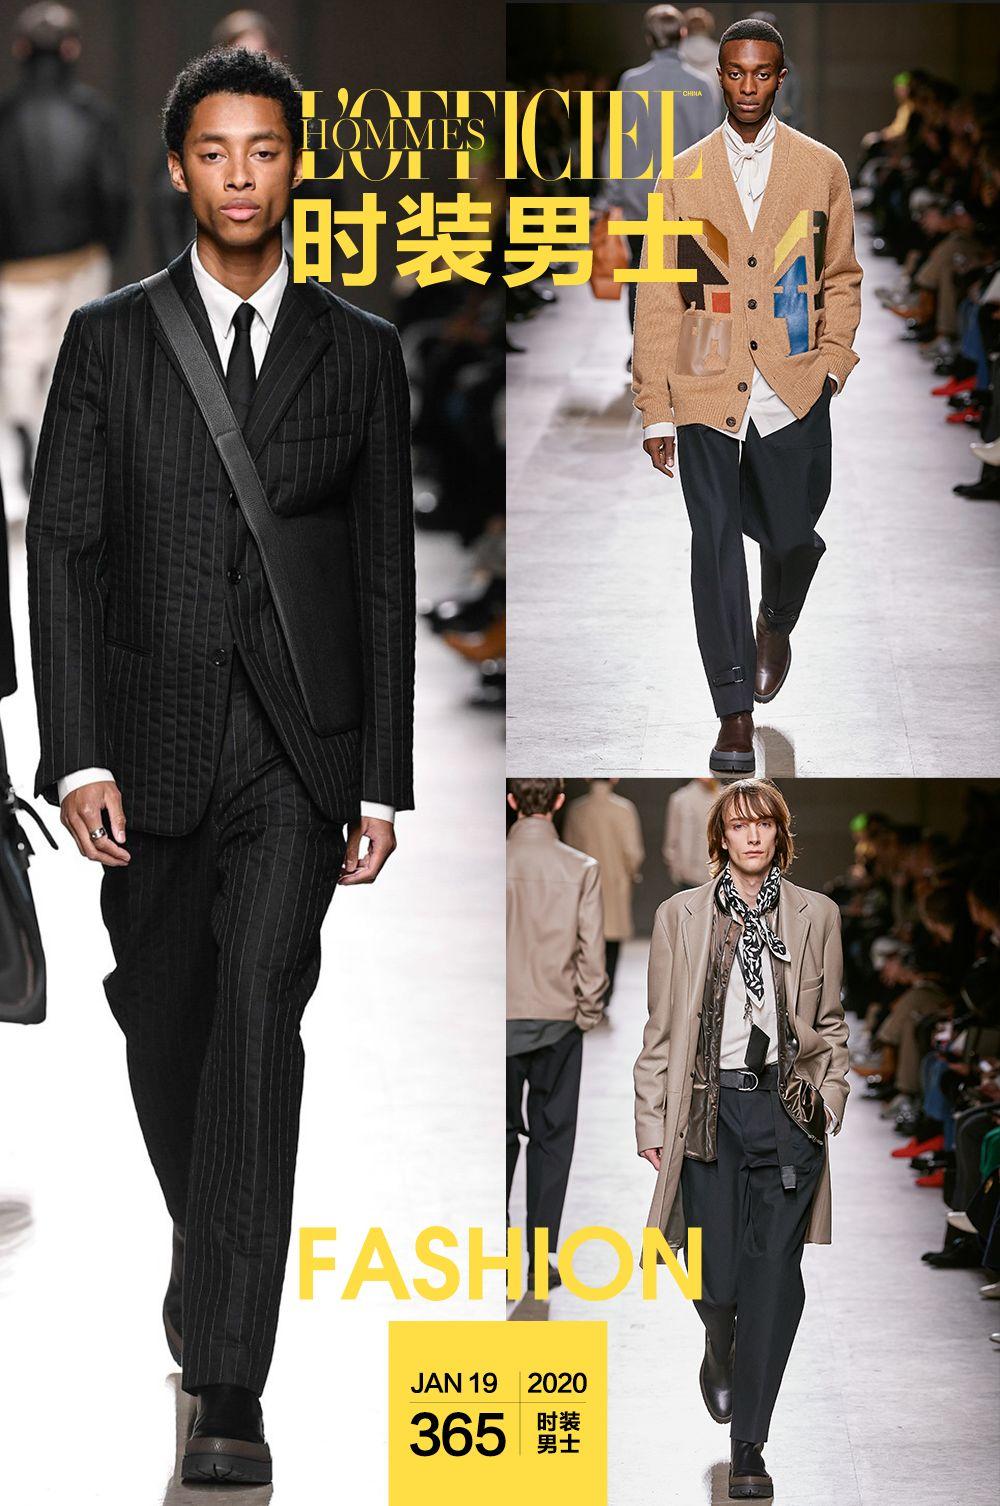 Hermès的绅士演绎法,从不被潮流「绑架 」